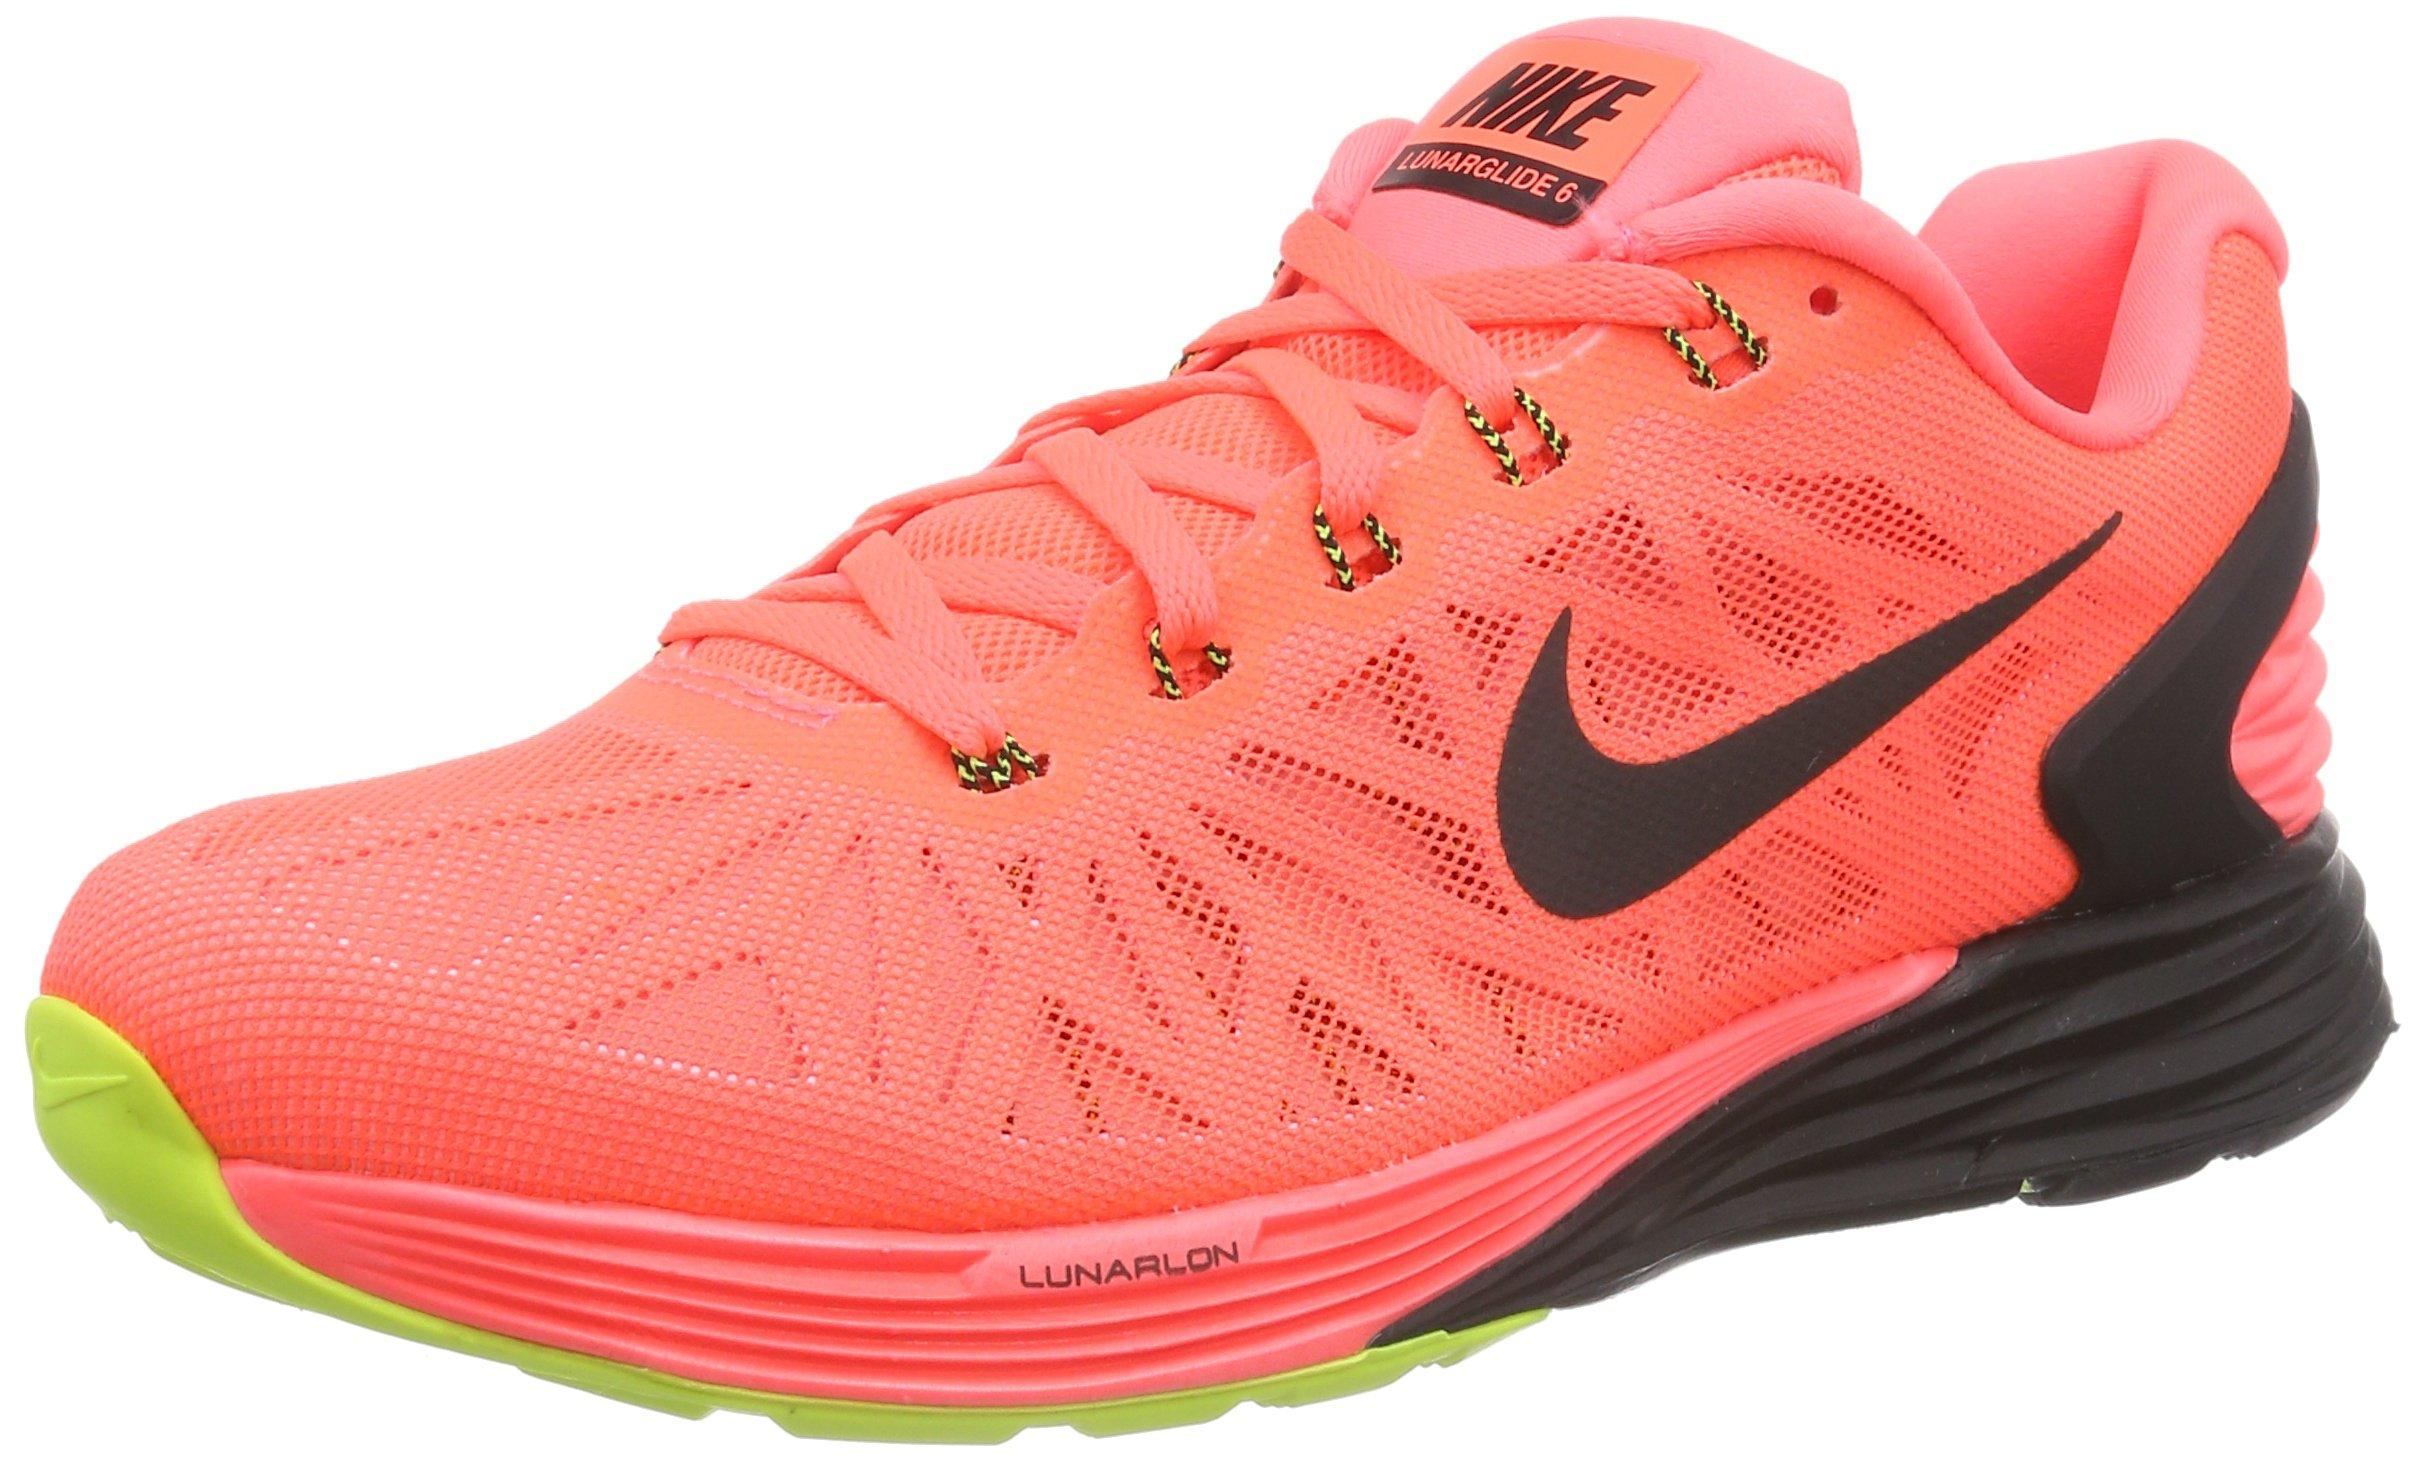 quality design c0d45 758d3 Galleon - Nike Lunarglide 6 Sz 10.5 Mens Running Shoes ...